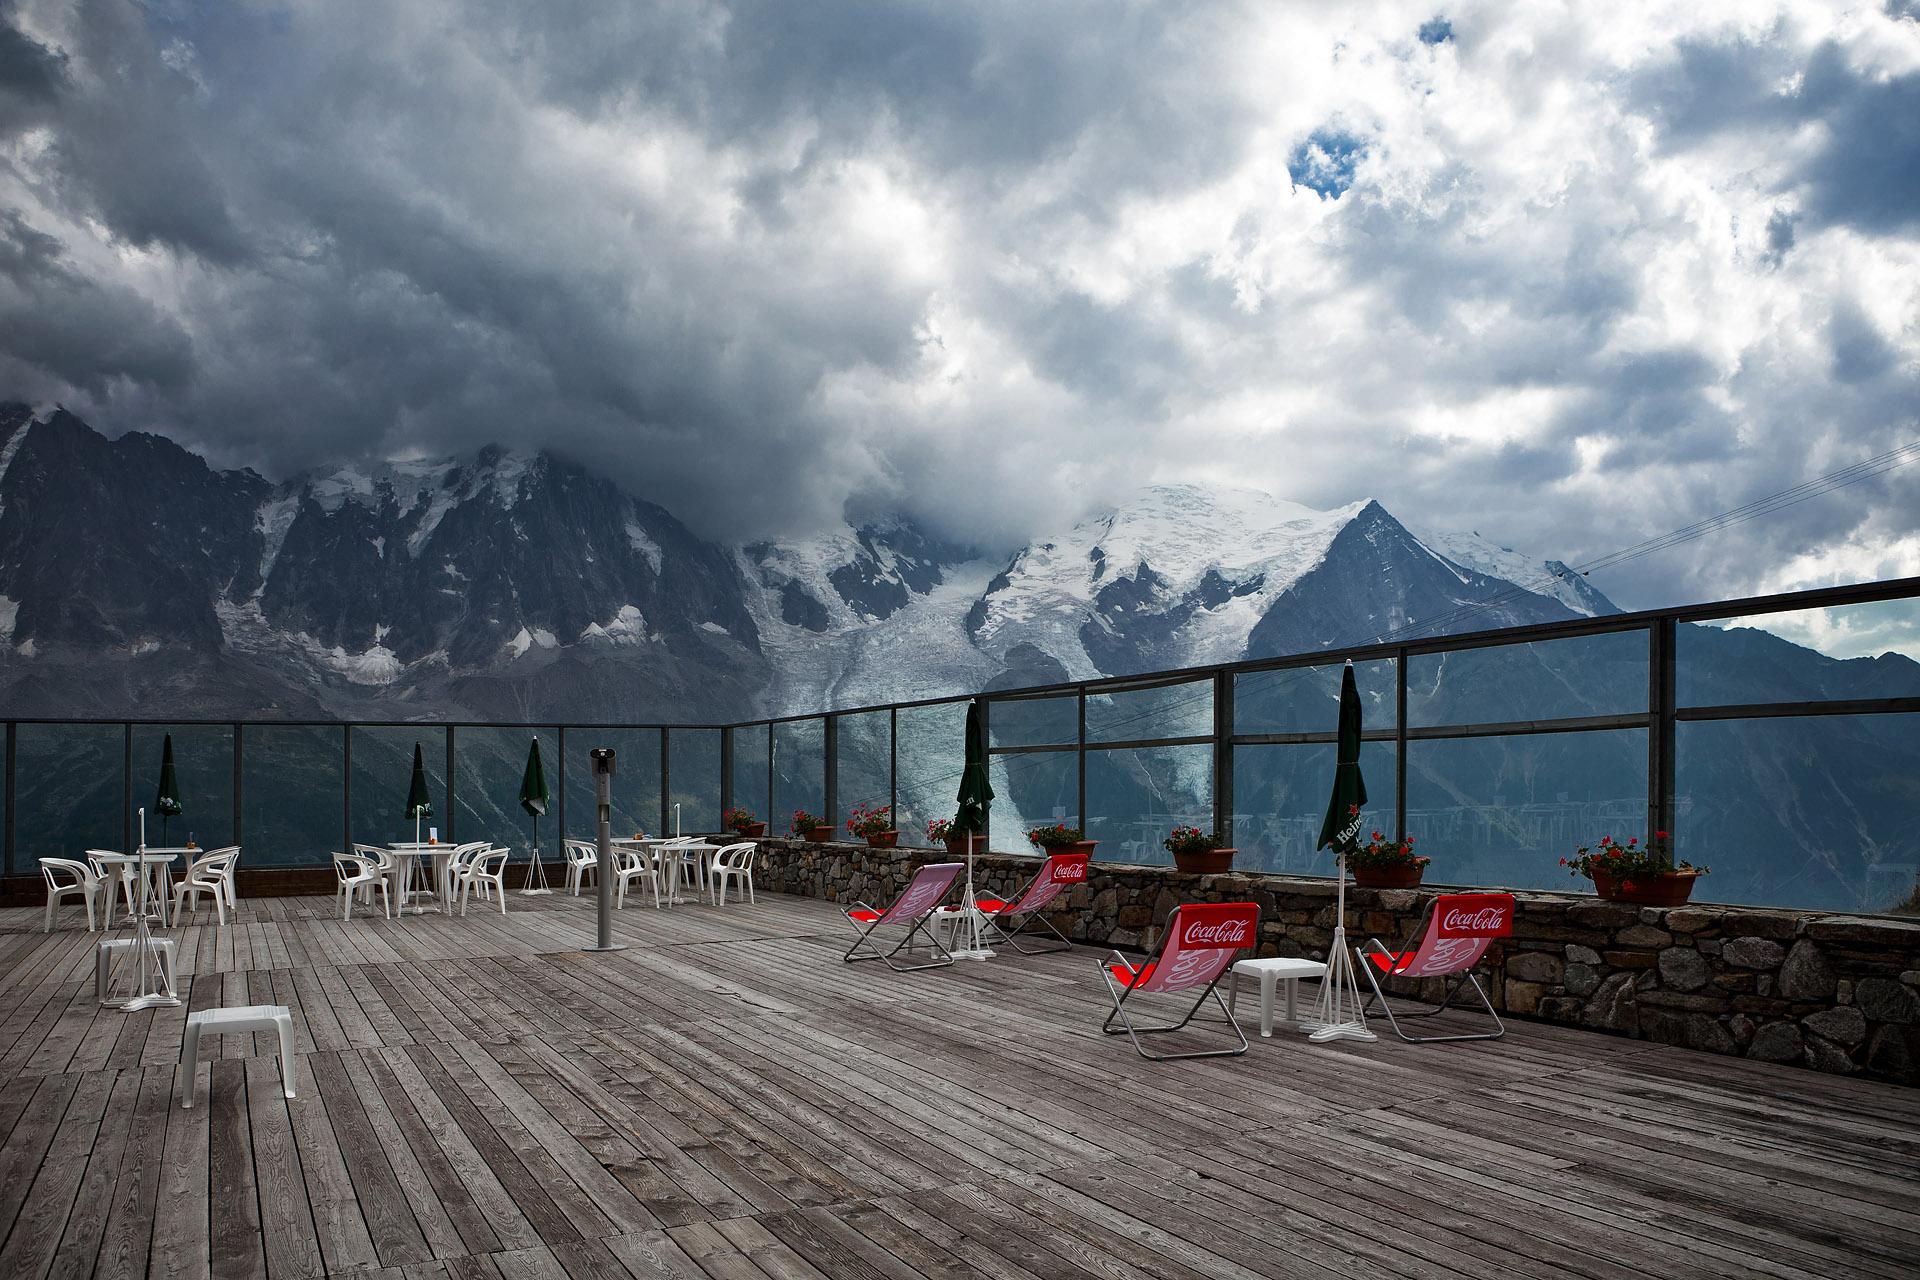 Wolken Berge Terrasse